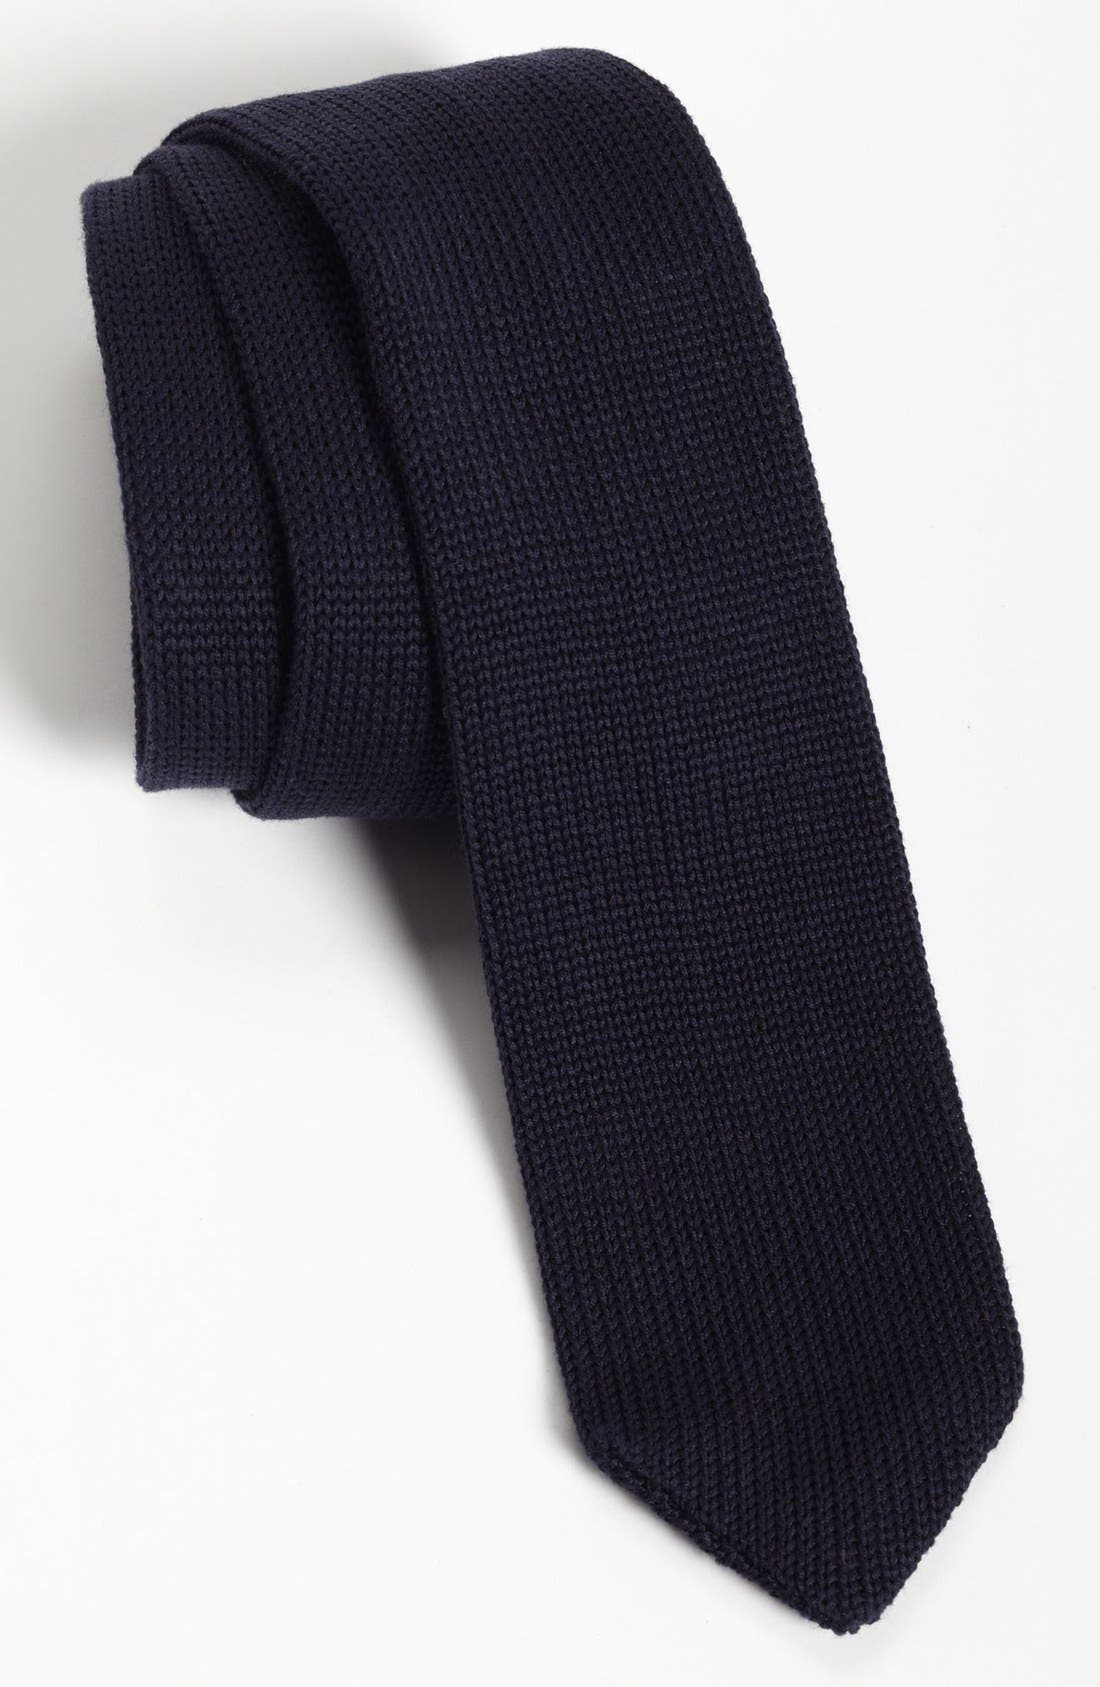 Main Image - BOSS Black Knit Tie